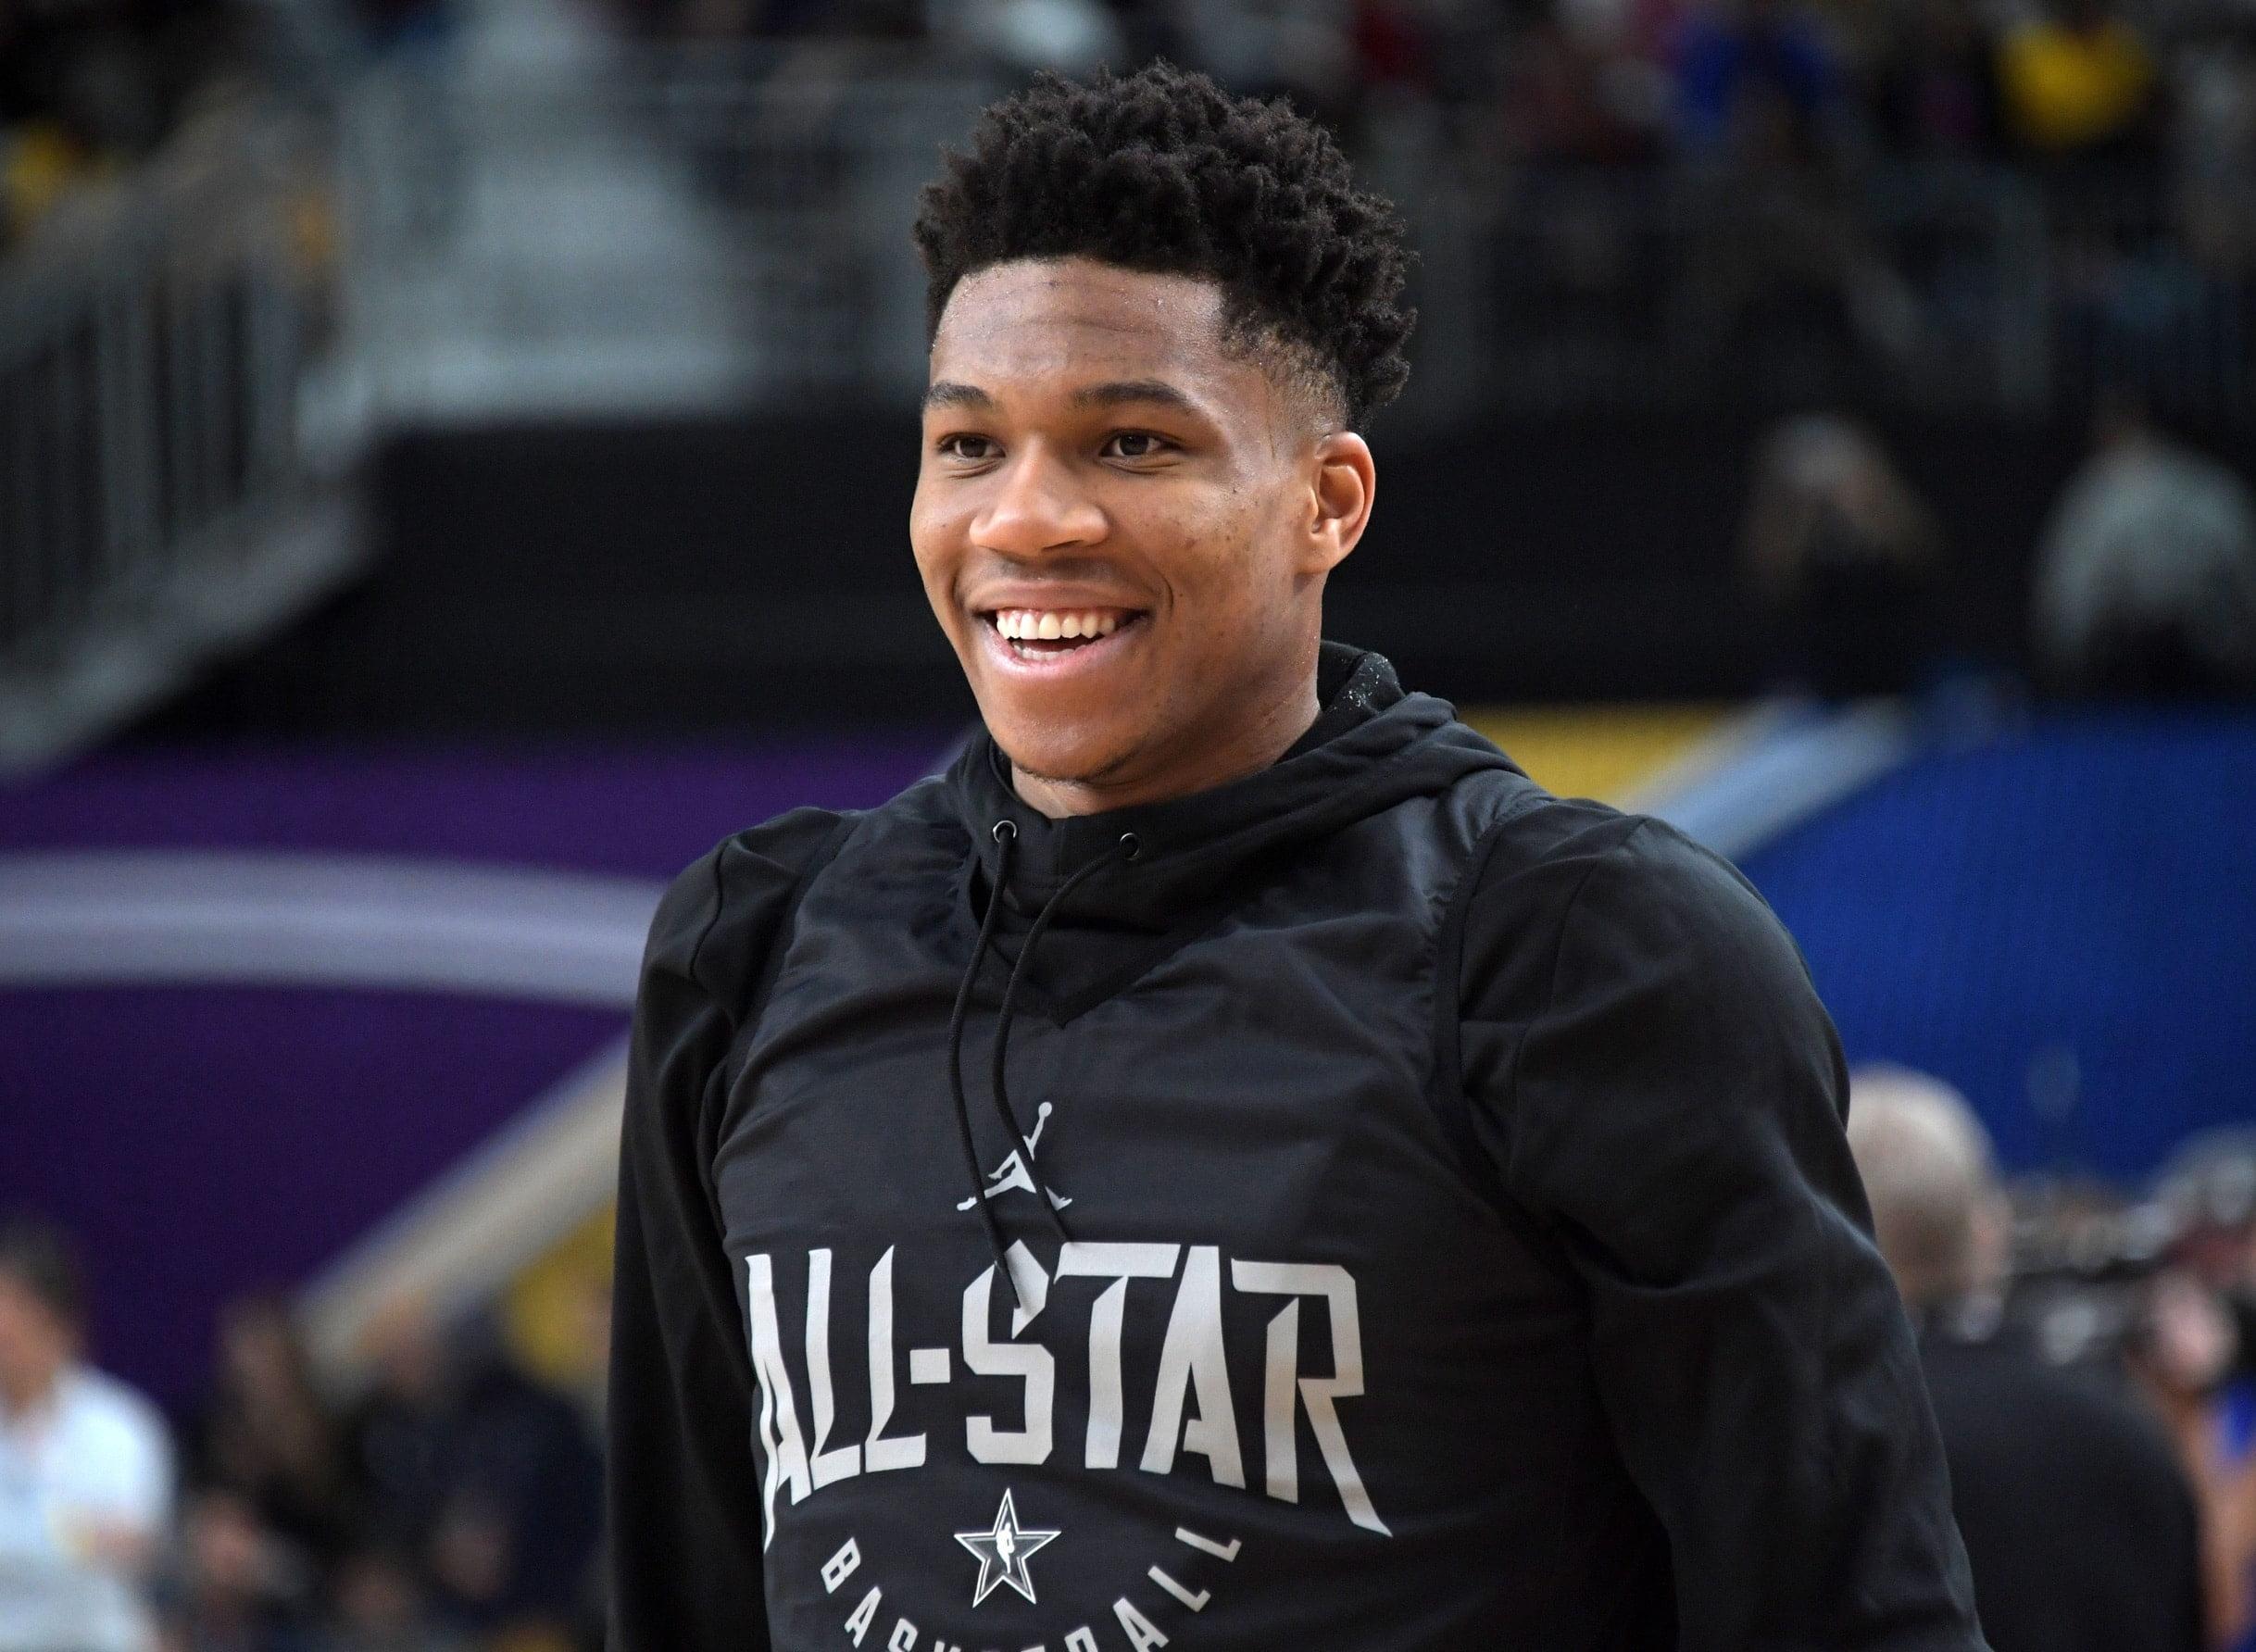 Giannis Antetokounmpo's younger brother to enter 2018 NBA Draft